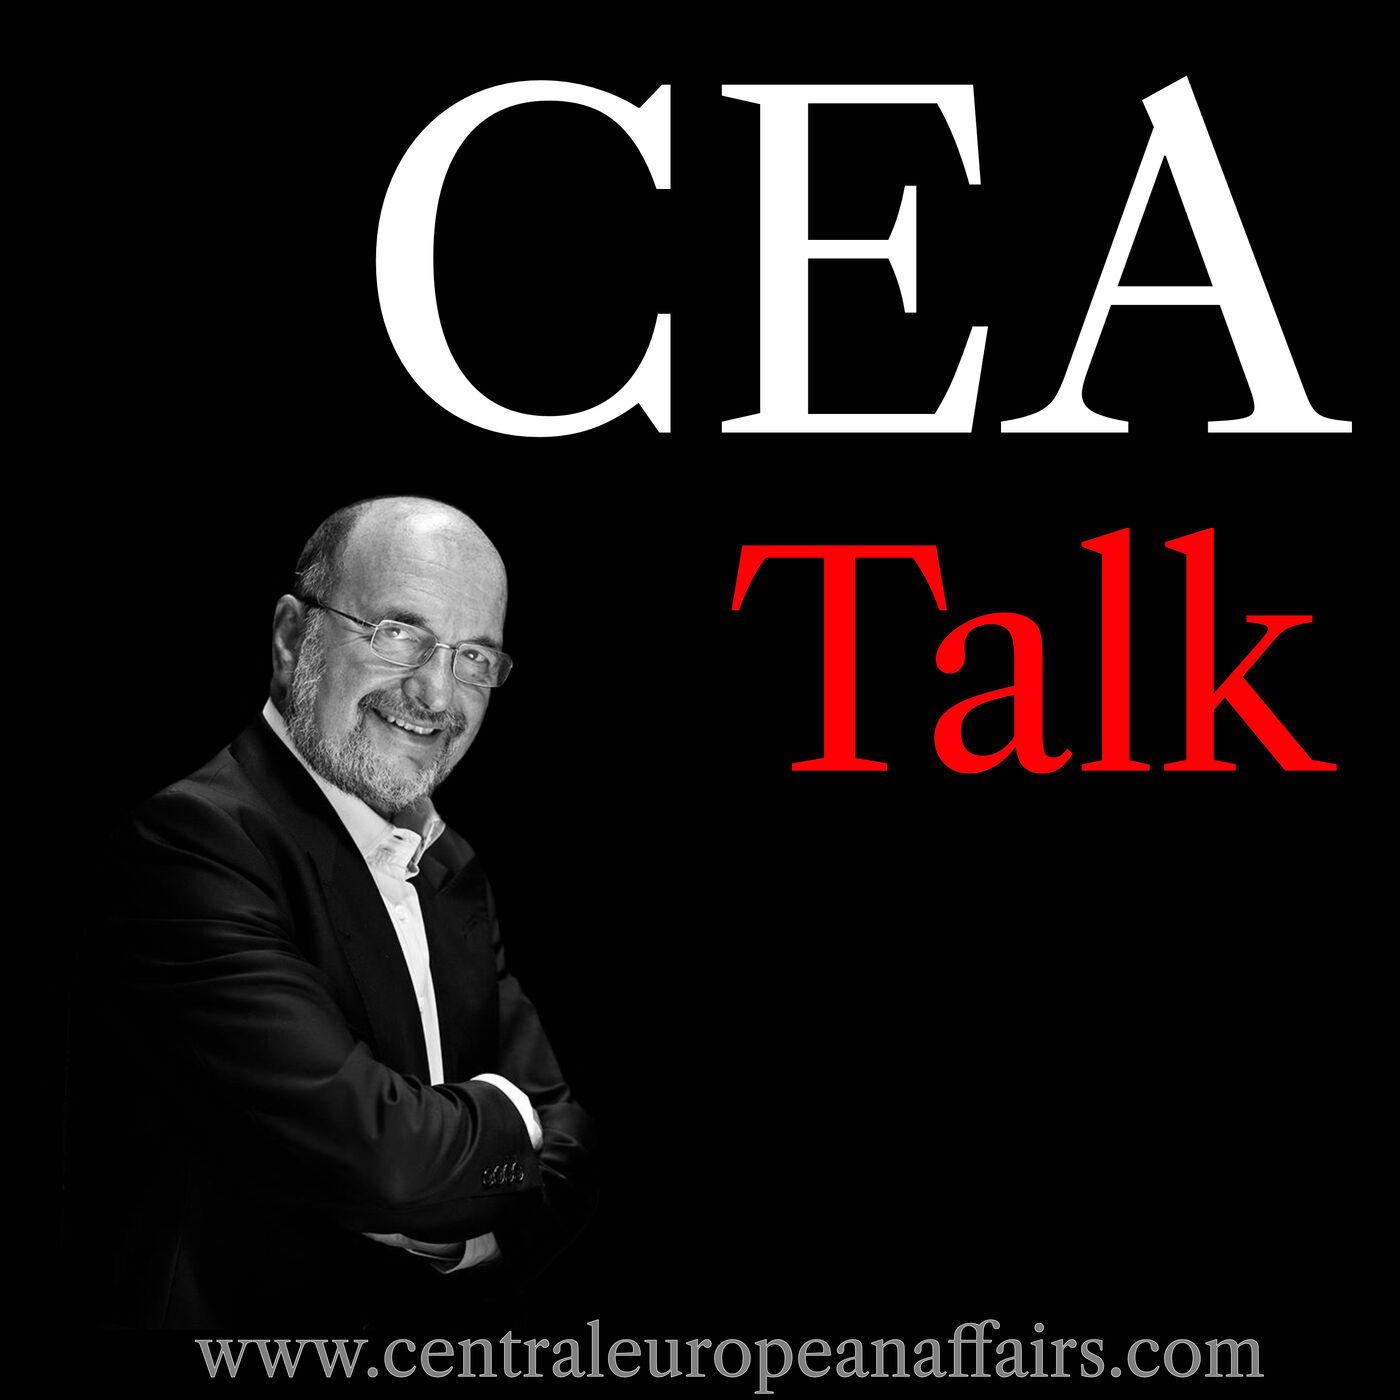 Bojár: Crony capitalism is killing the entrepreneurial spirit